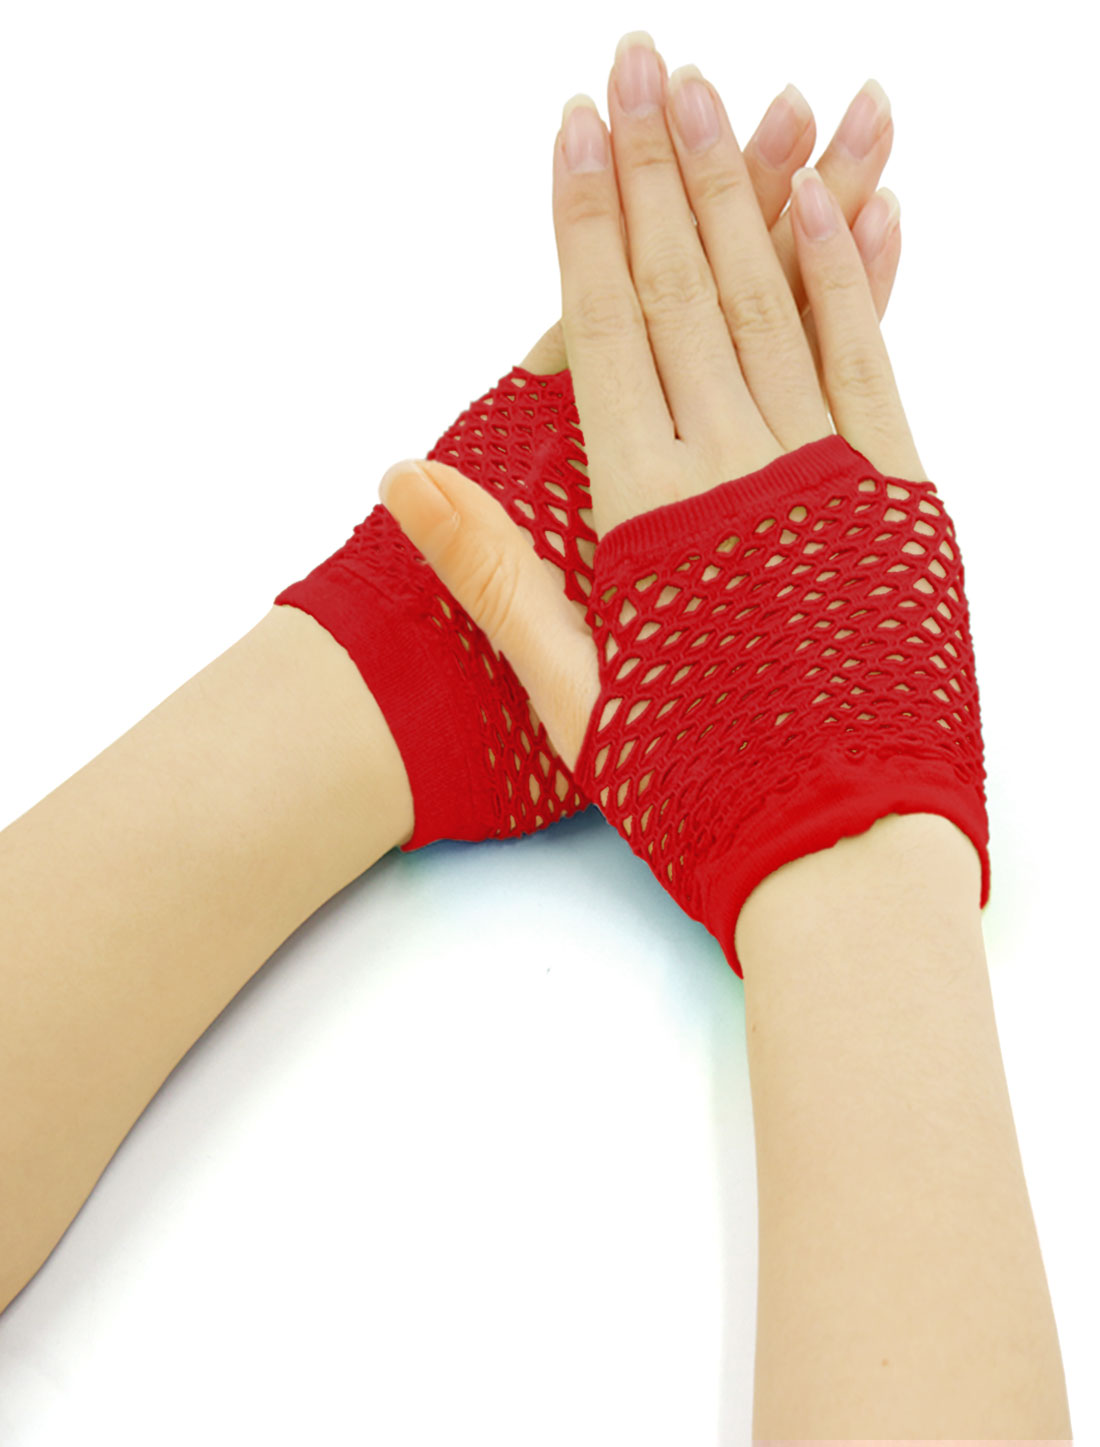 Women Wrist Length Stretchy Fingerless Fishnet Gloves 2 Pairs Red